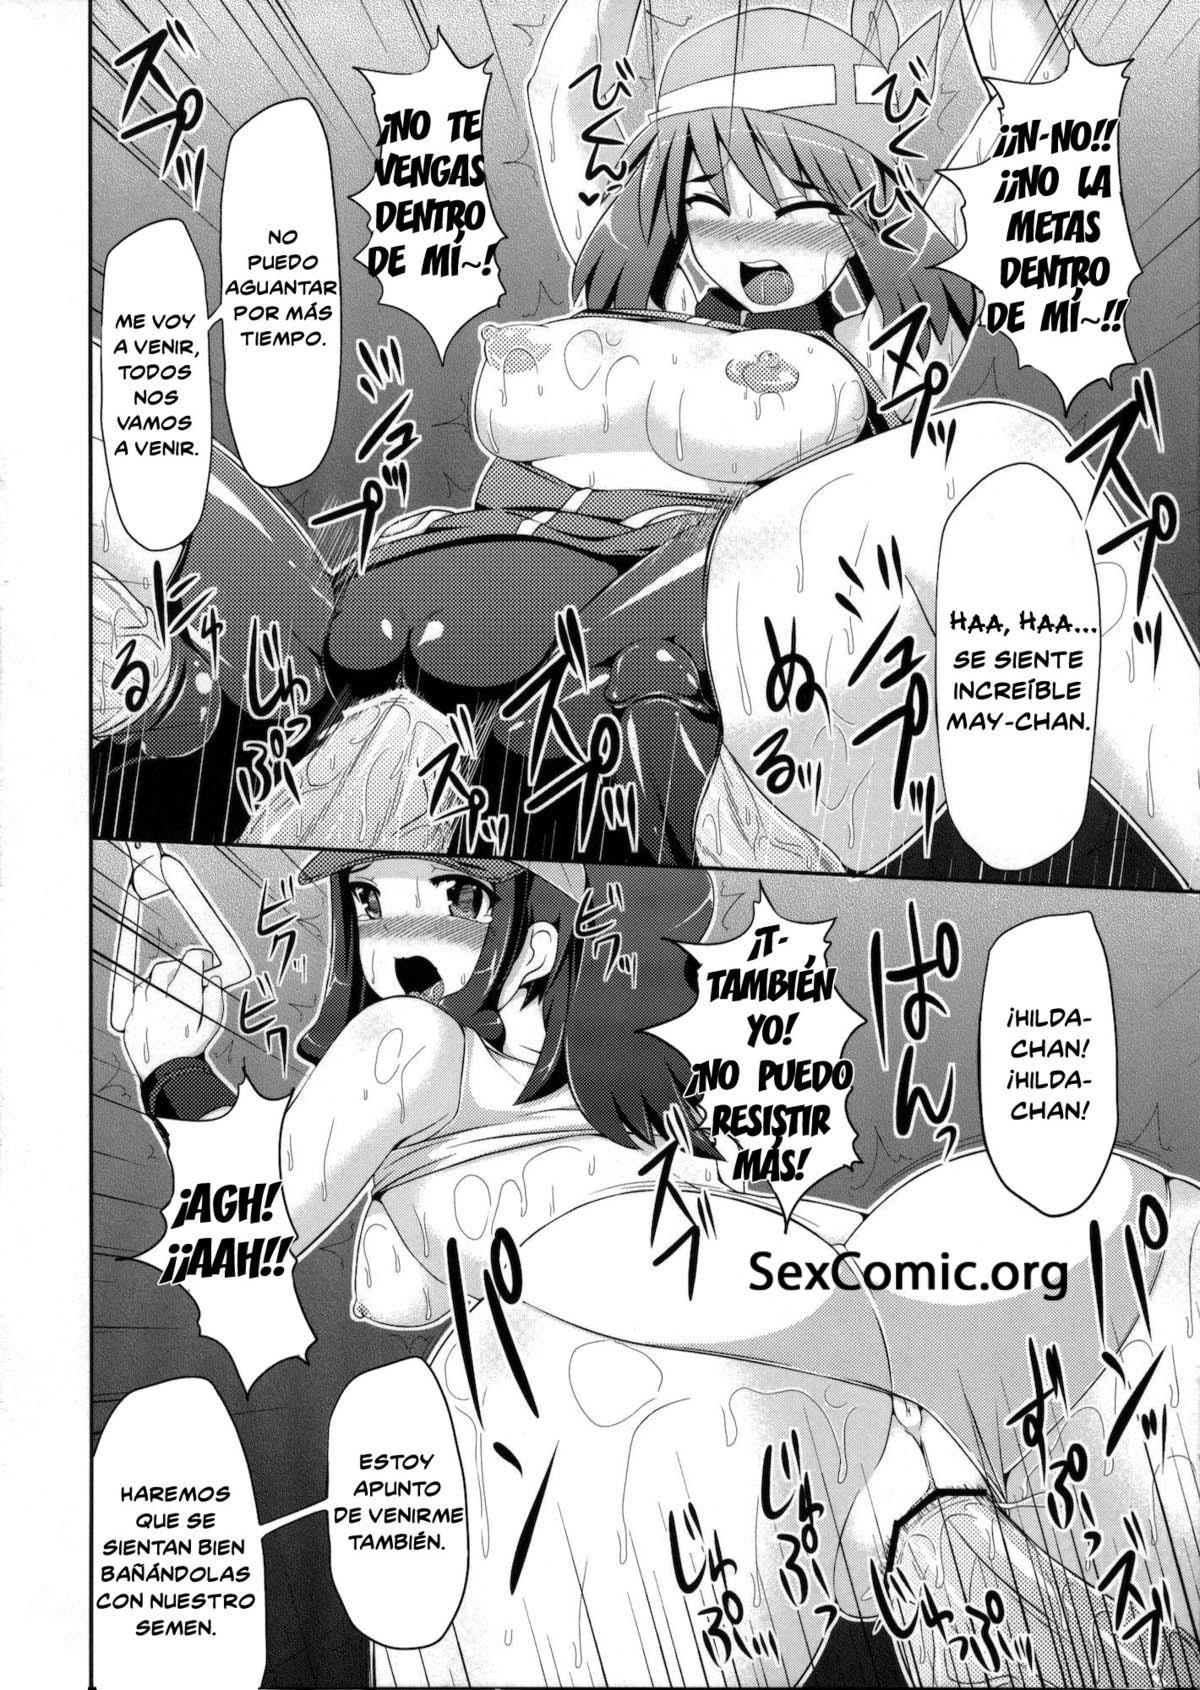 sexo-en-el-metro-pokemon-xxx-mangas-para-adultos-comics-xxx-hentai-incesto-historias-eroticas-fantacias-sexuales-videos-porno-gratis-online-25